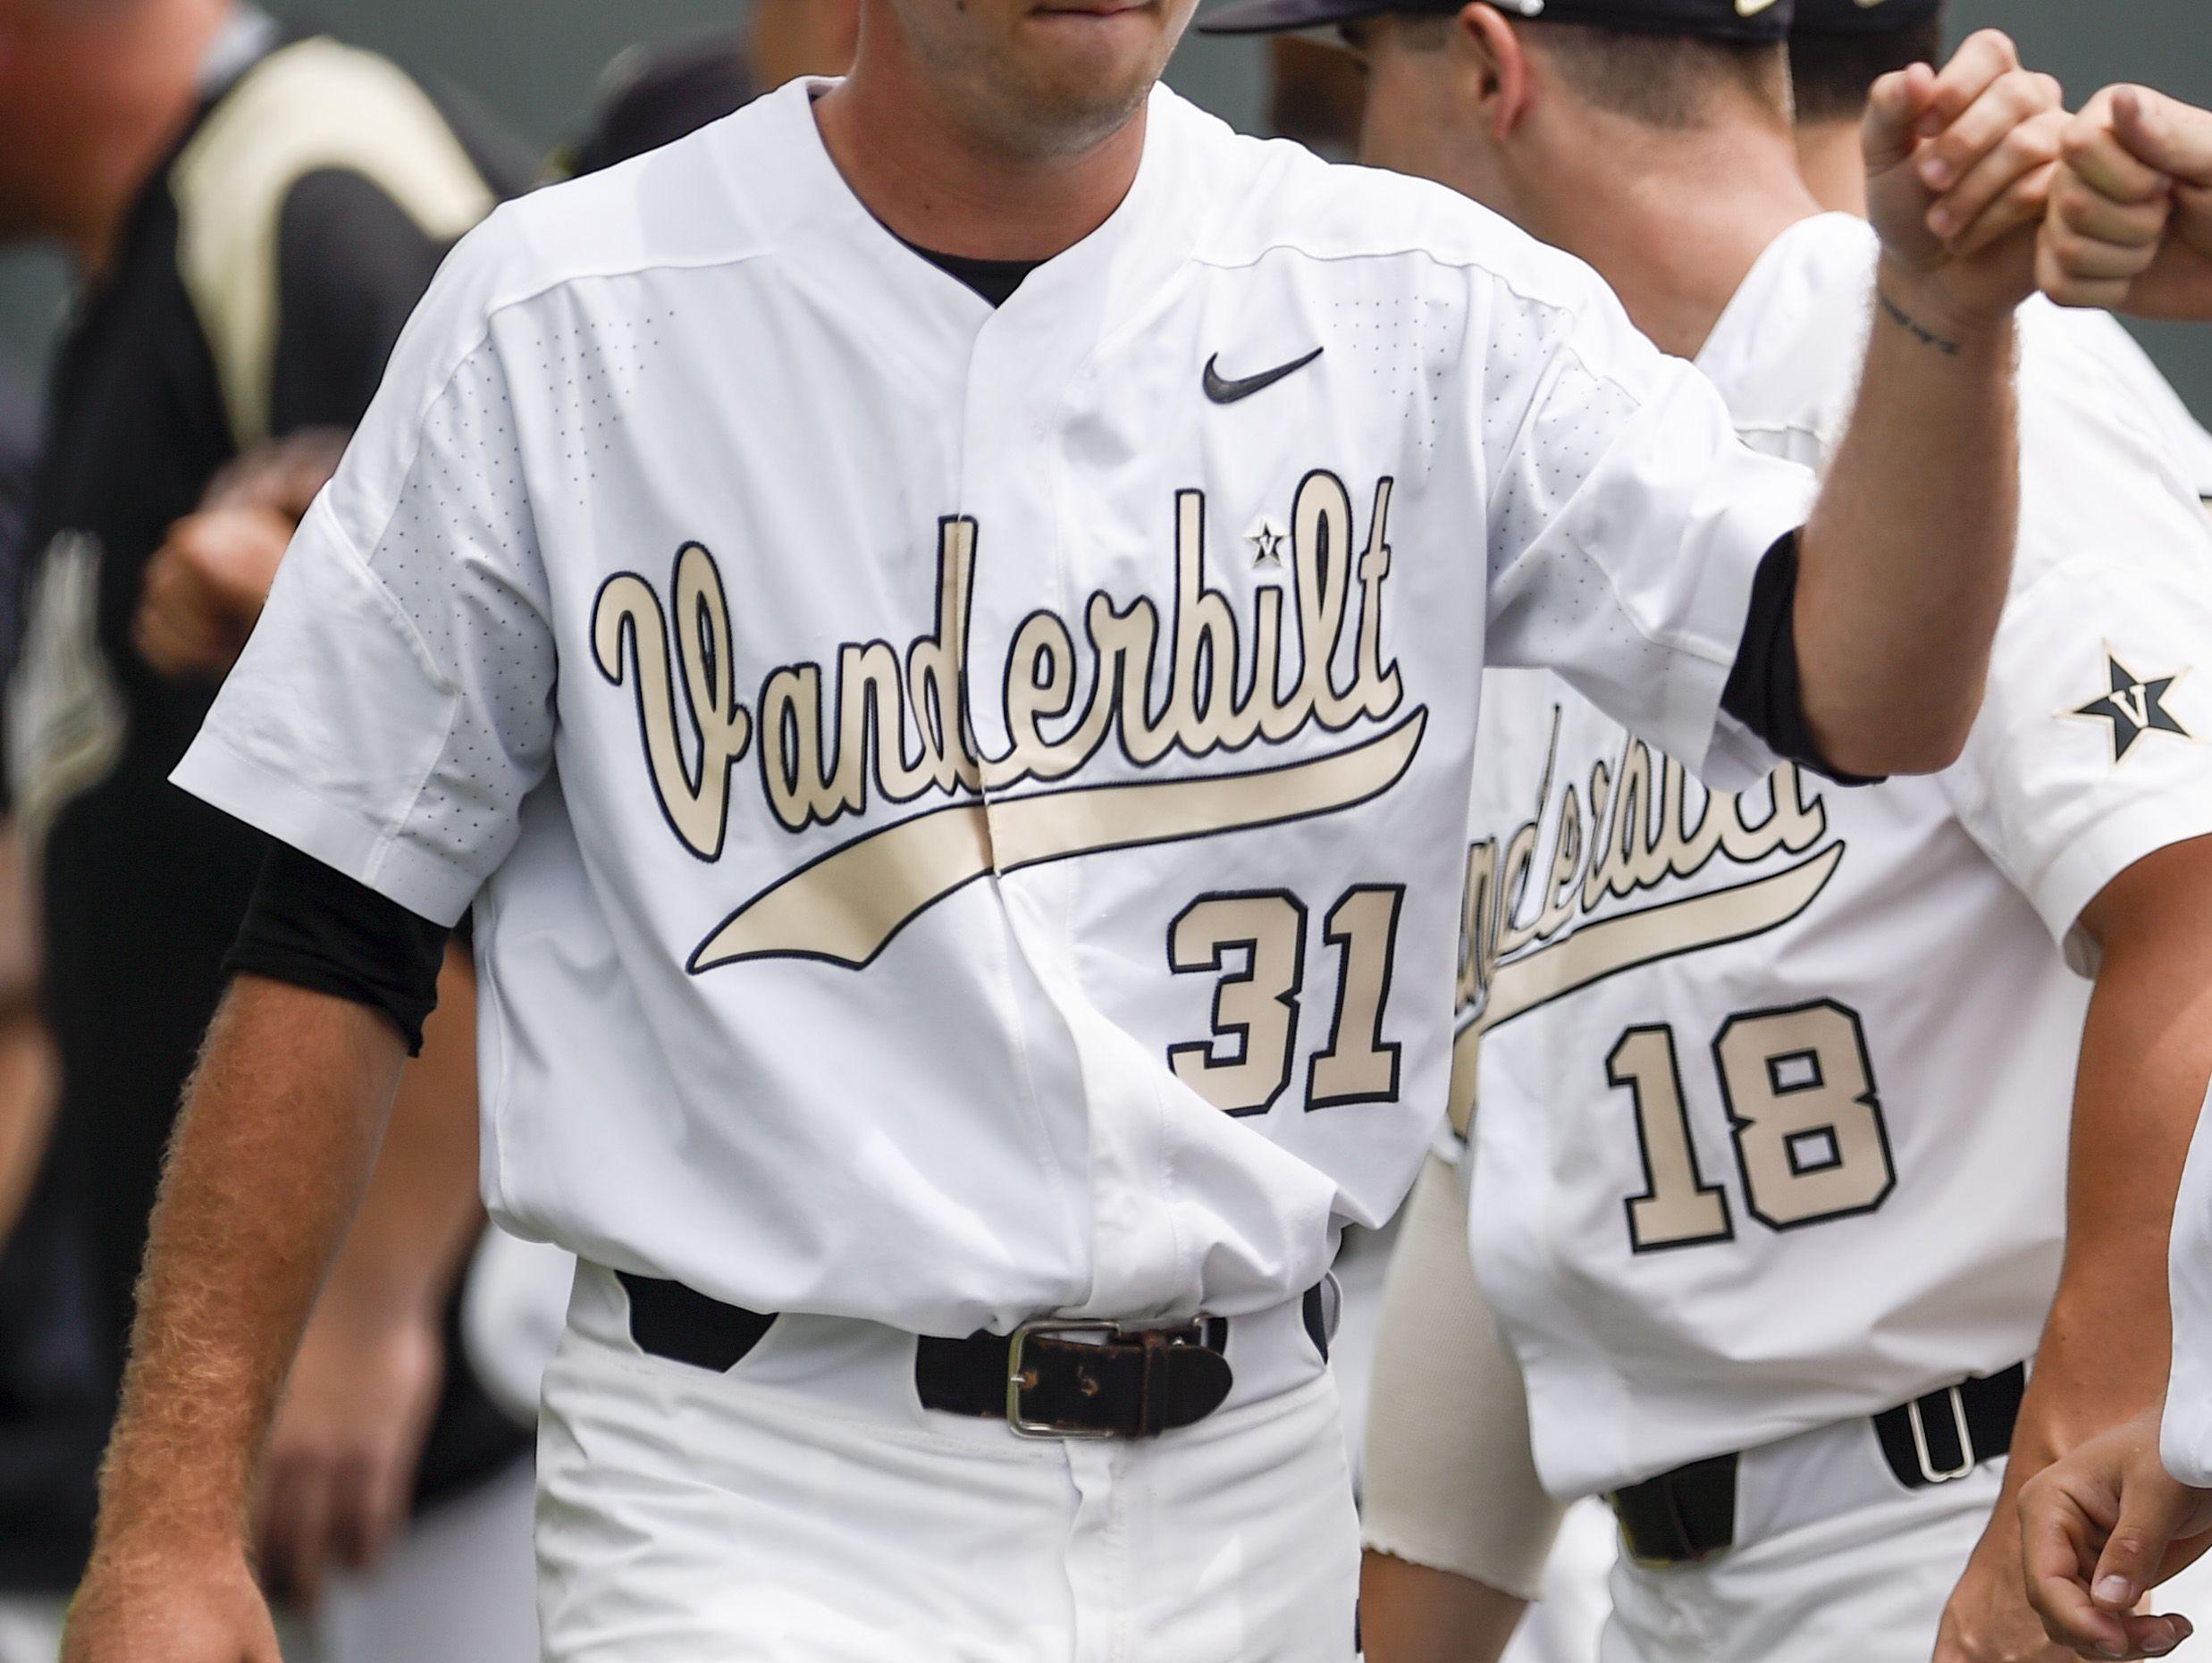 Vanderbilt pitcher Ryan Johnson (31) greets teammates before a NCAA Regional baseball game against Xavier at Hawkins Field, Saturday, June 4, 2016, in Nashville, Tenn.